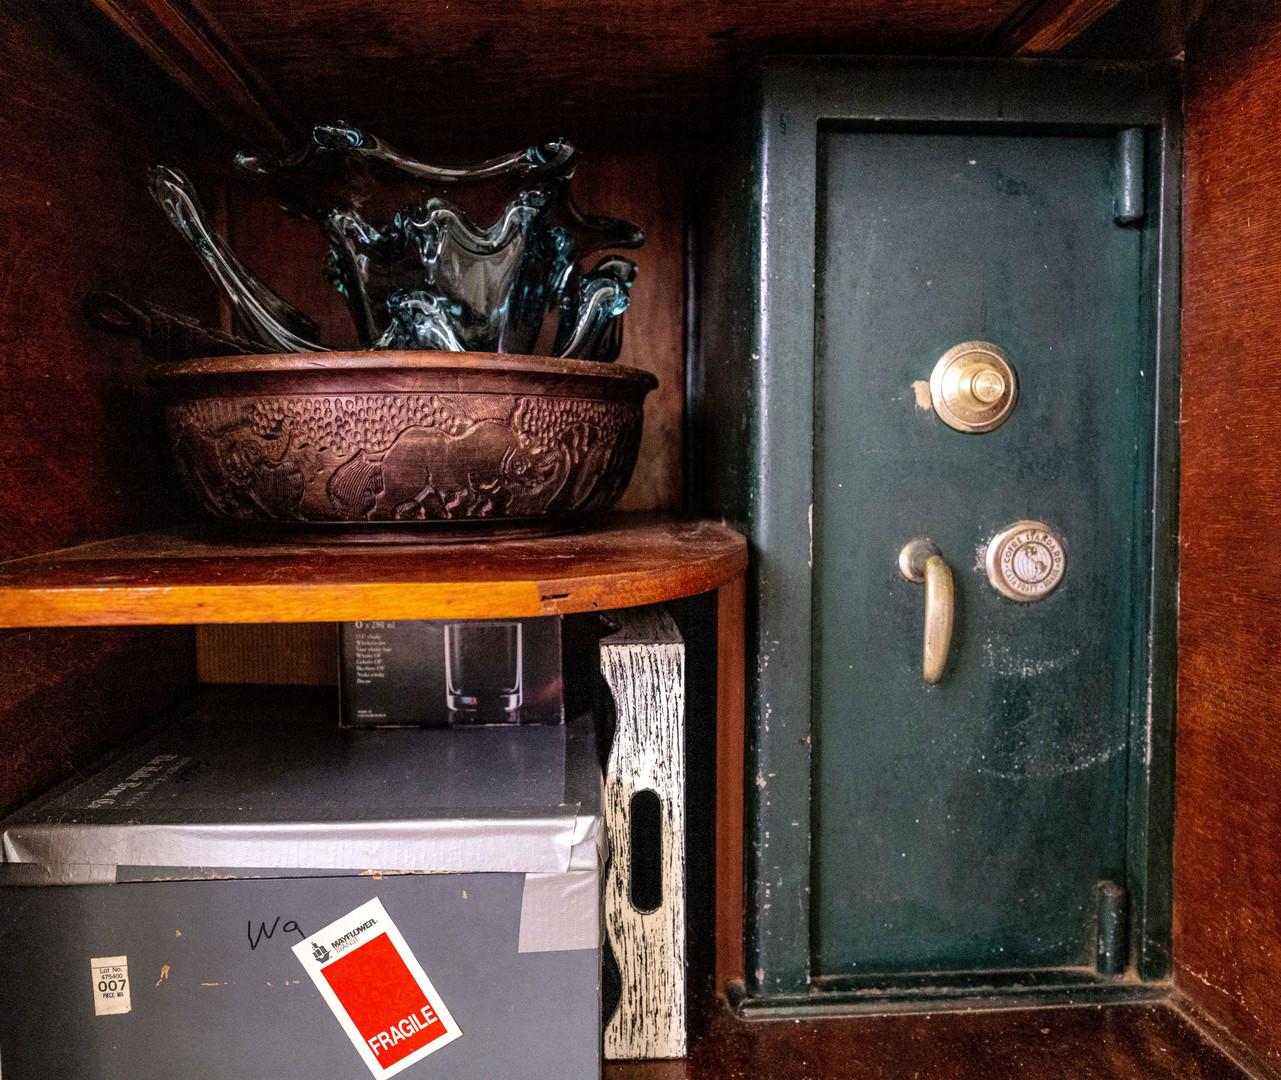 Bottom part of dining room closet